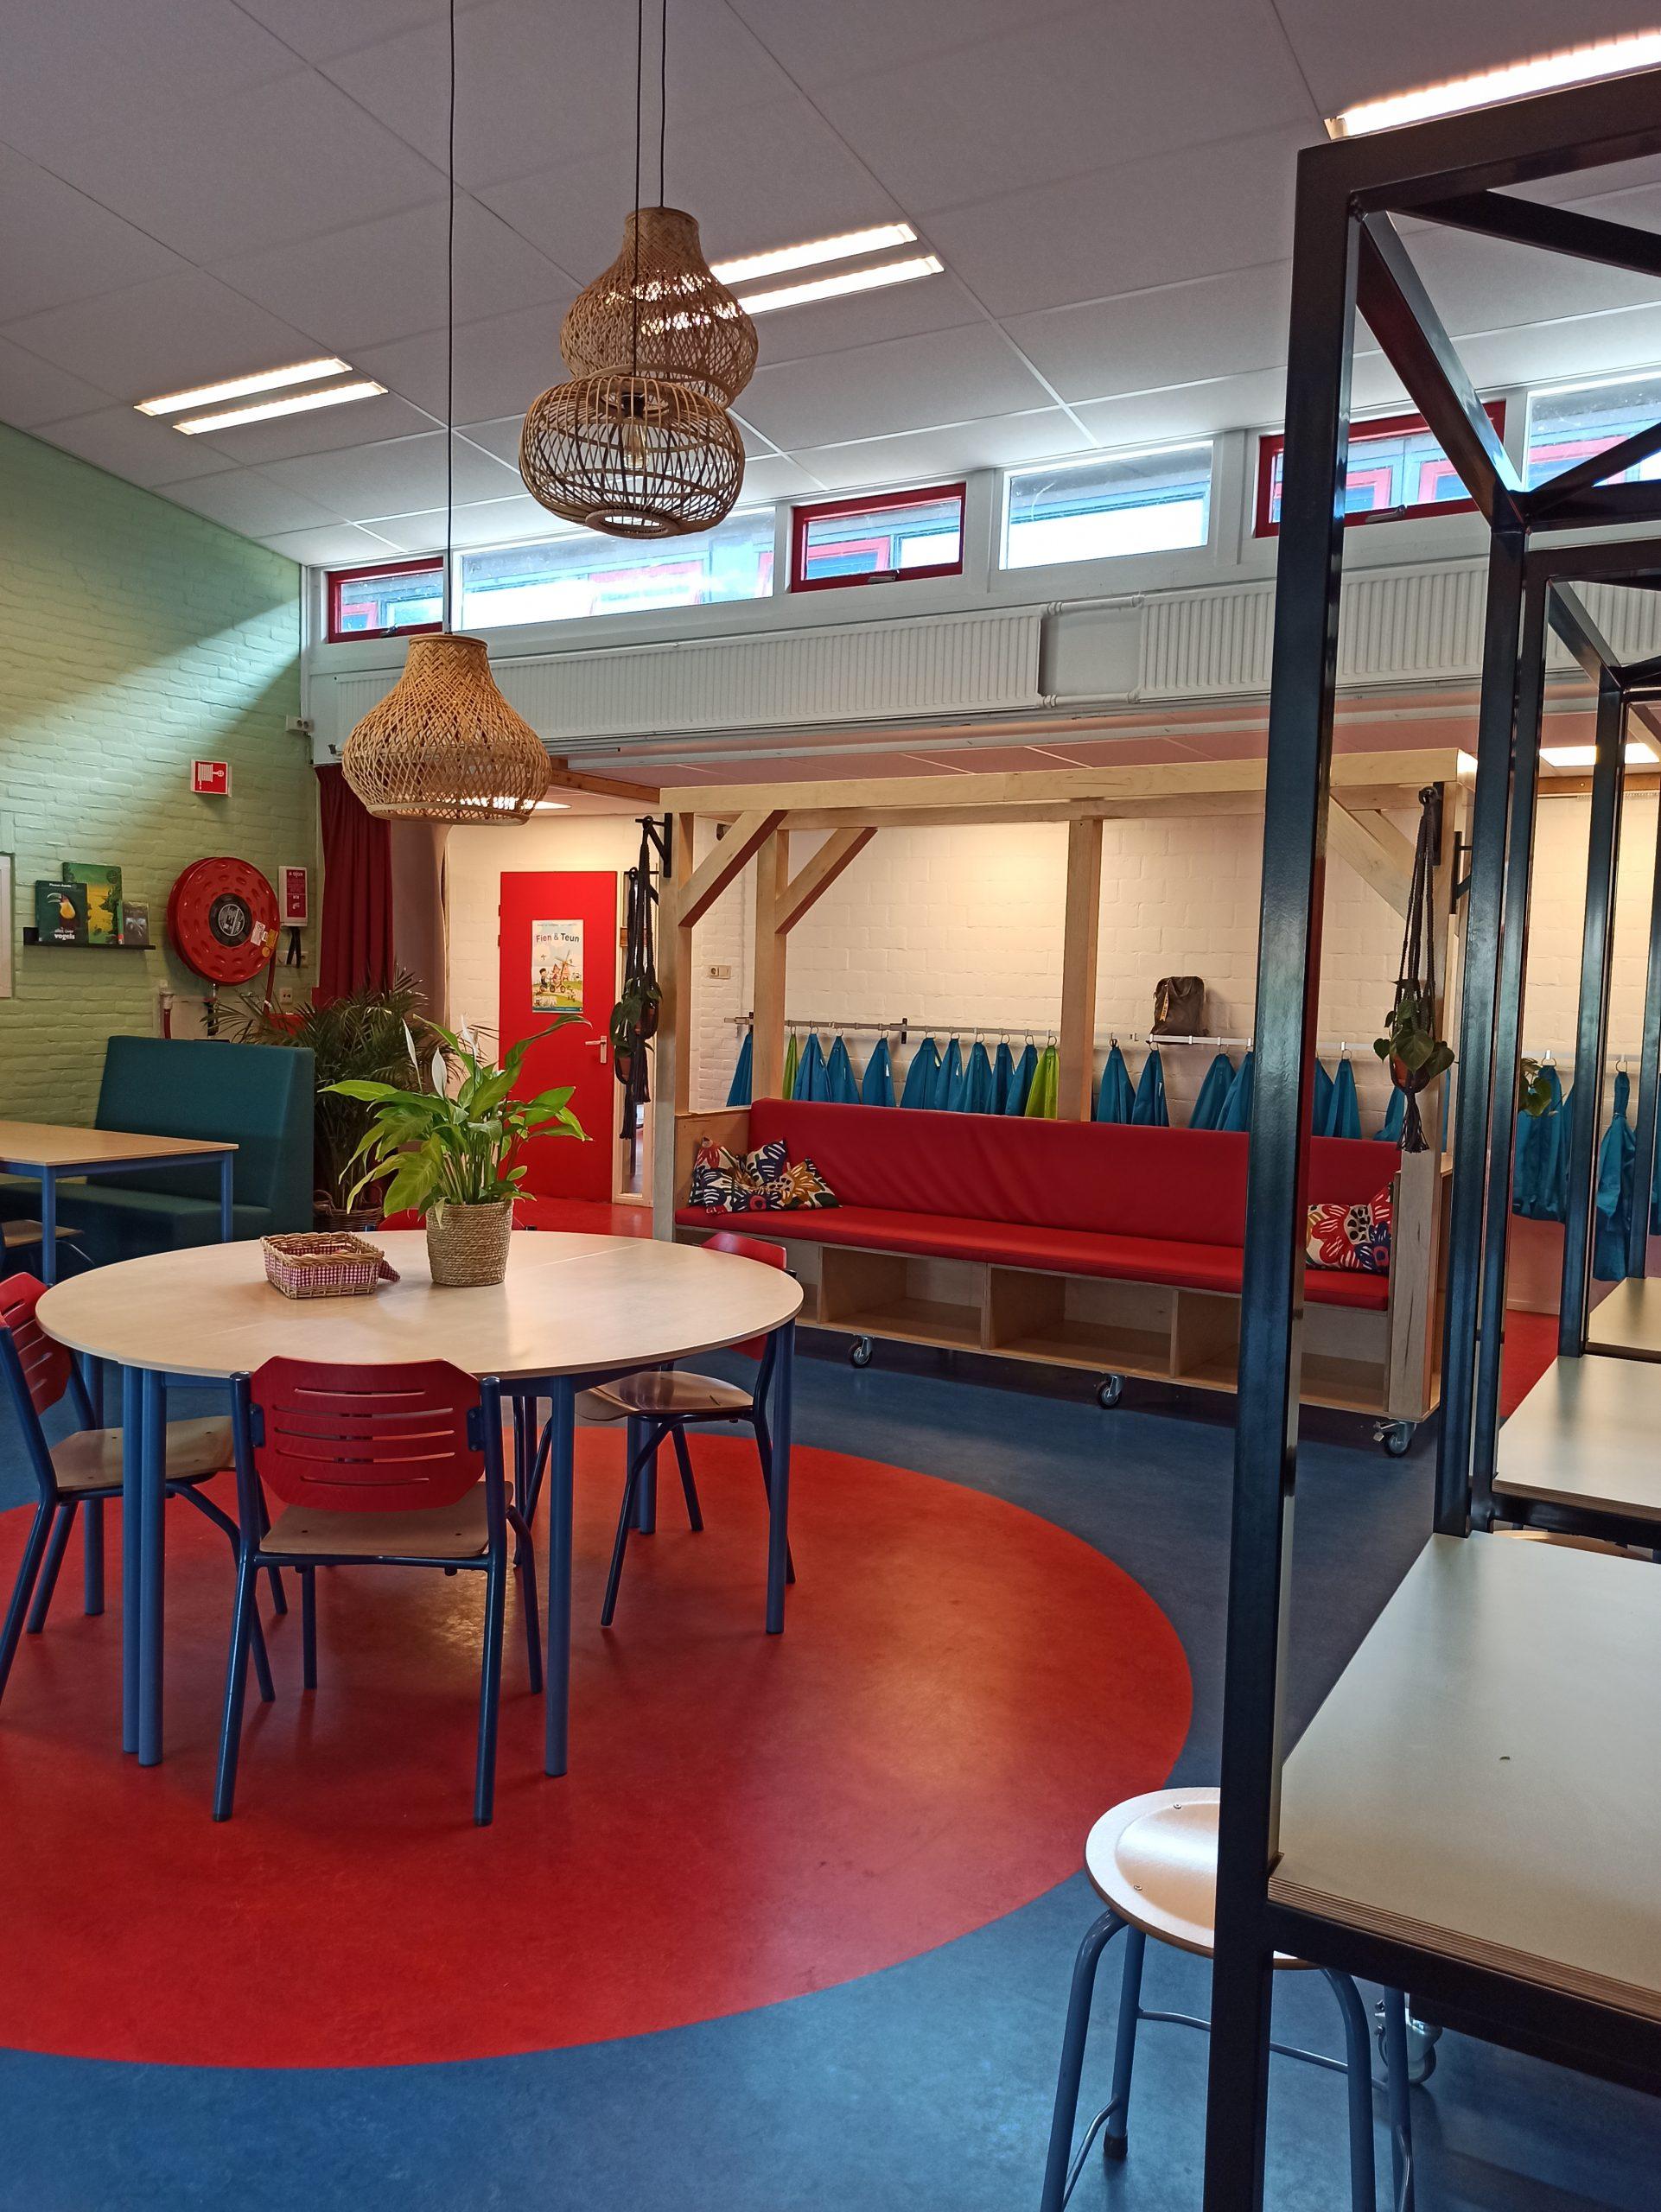 nterieur leerplein Burgemeester Westerbeek van Eertenschool